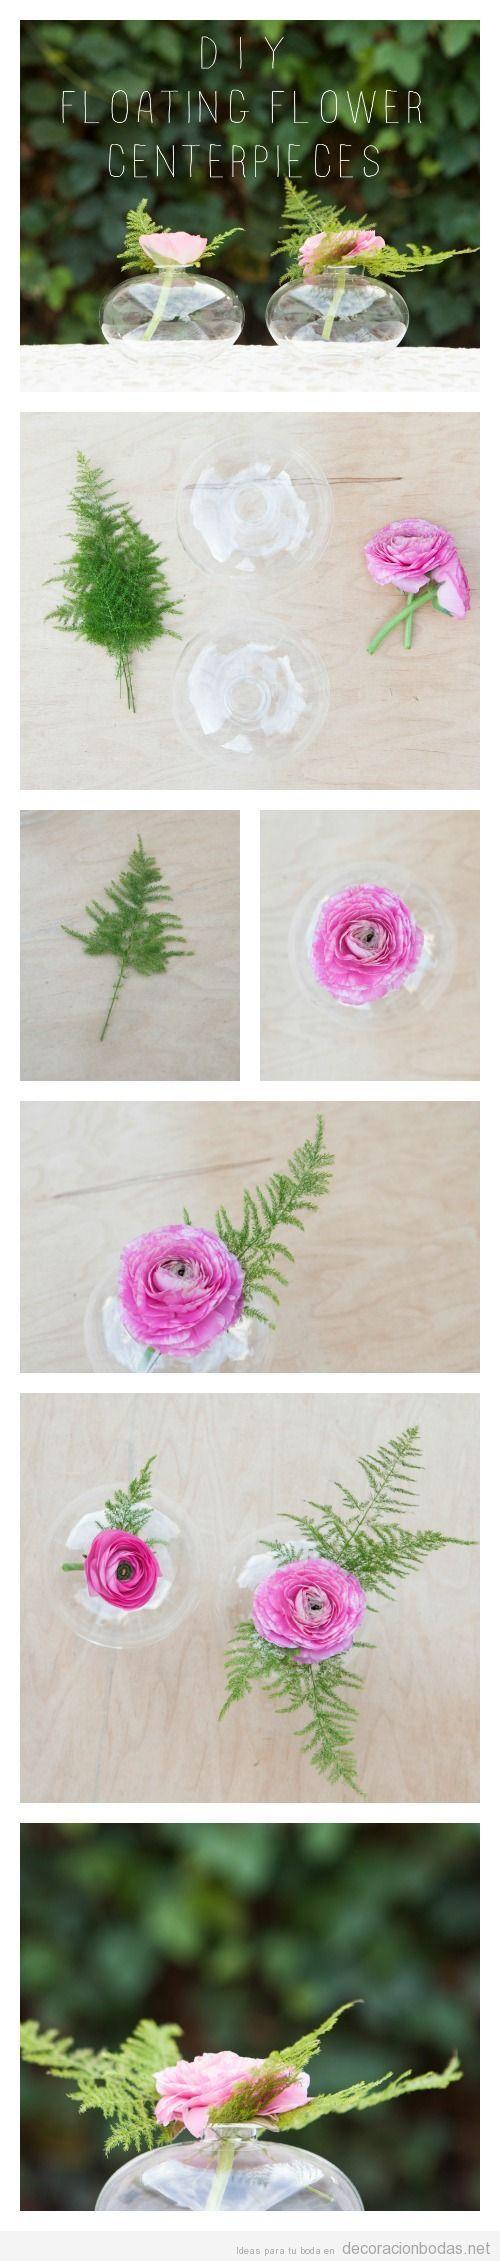 Decoración centro mesa boda flor flotante, manualidad DIY